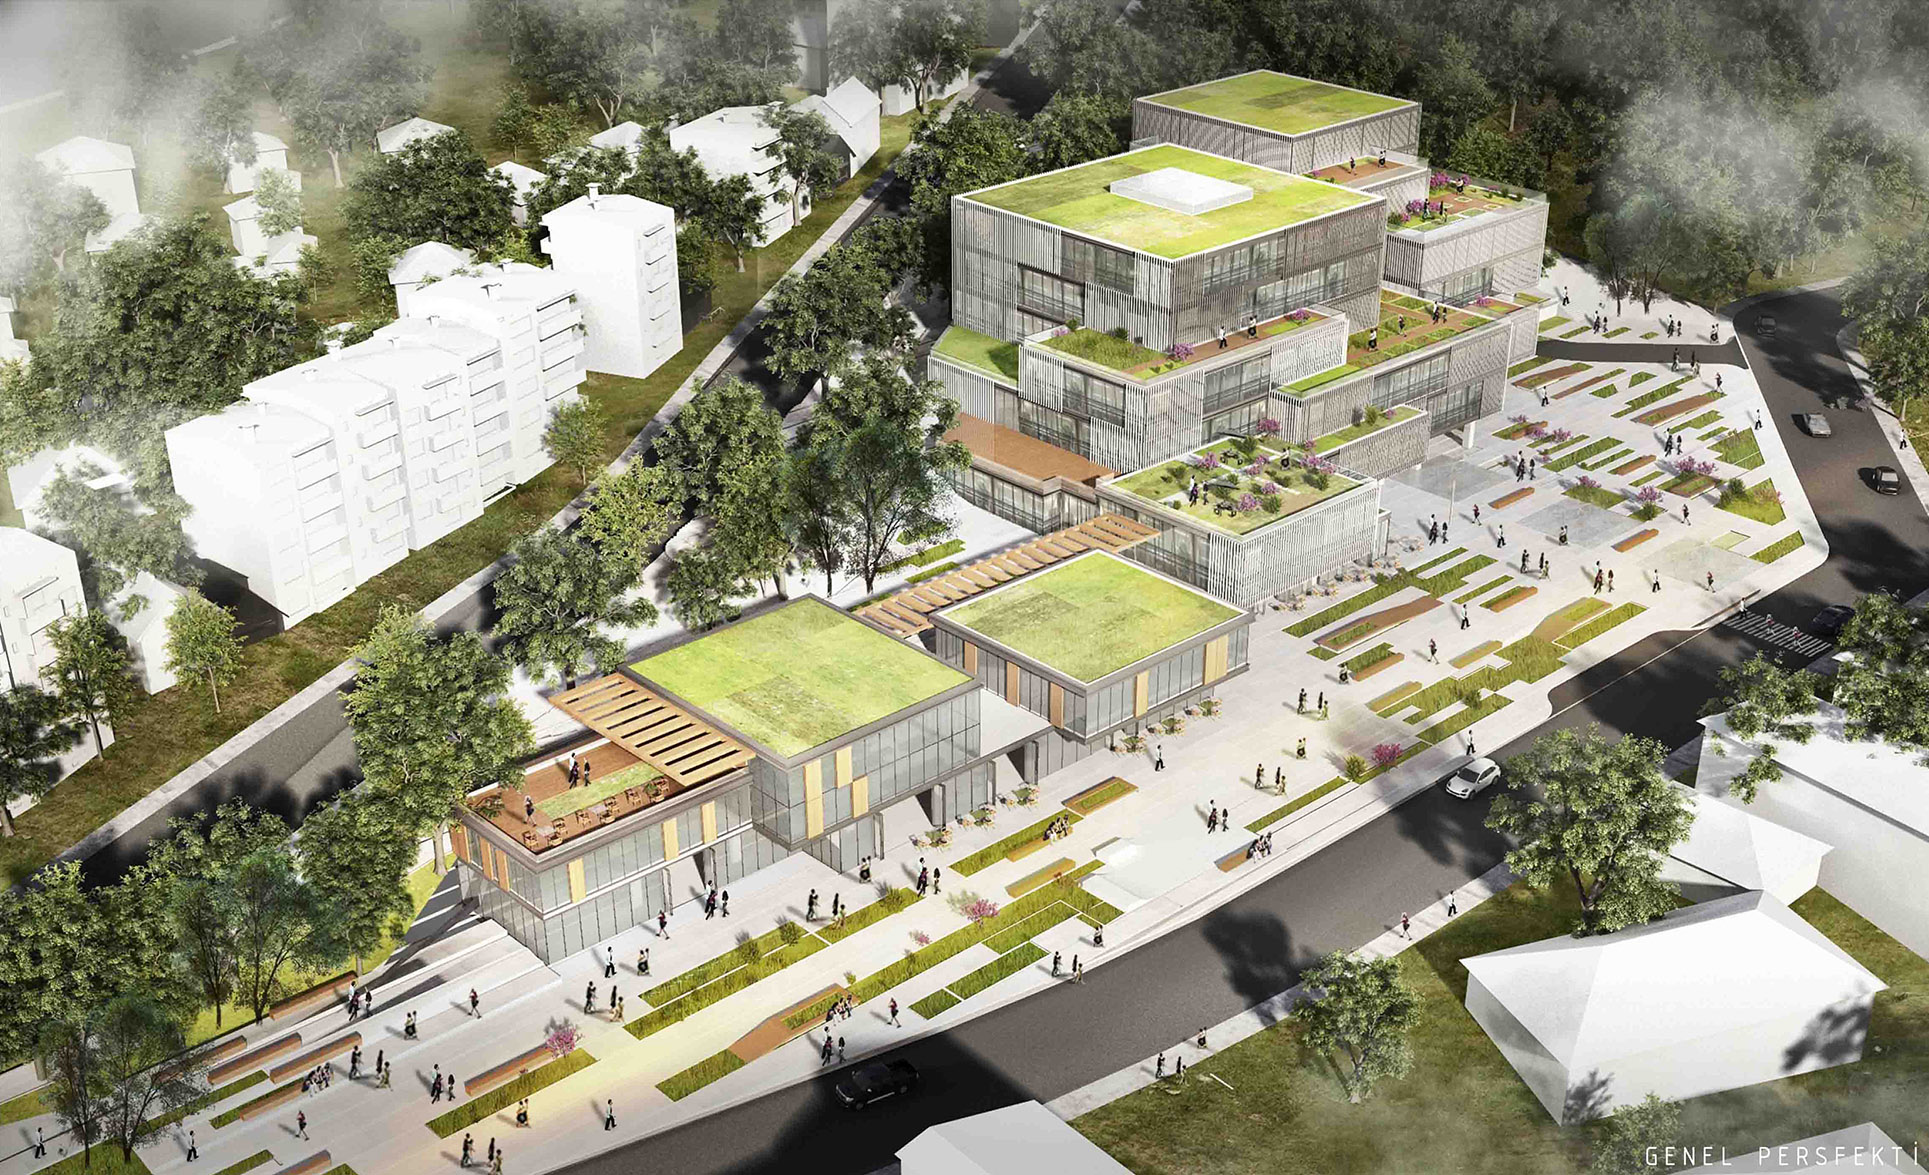 dodofis mimarlık süleymanpaşa ofis binası 02